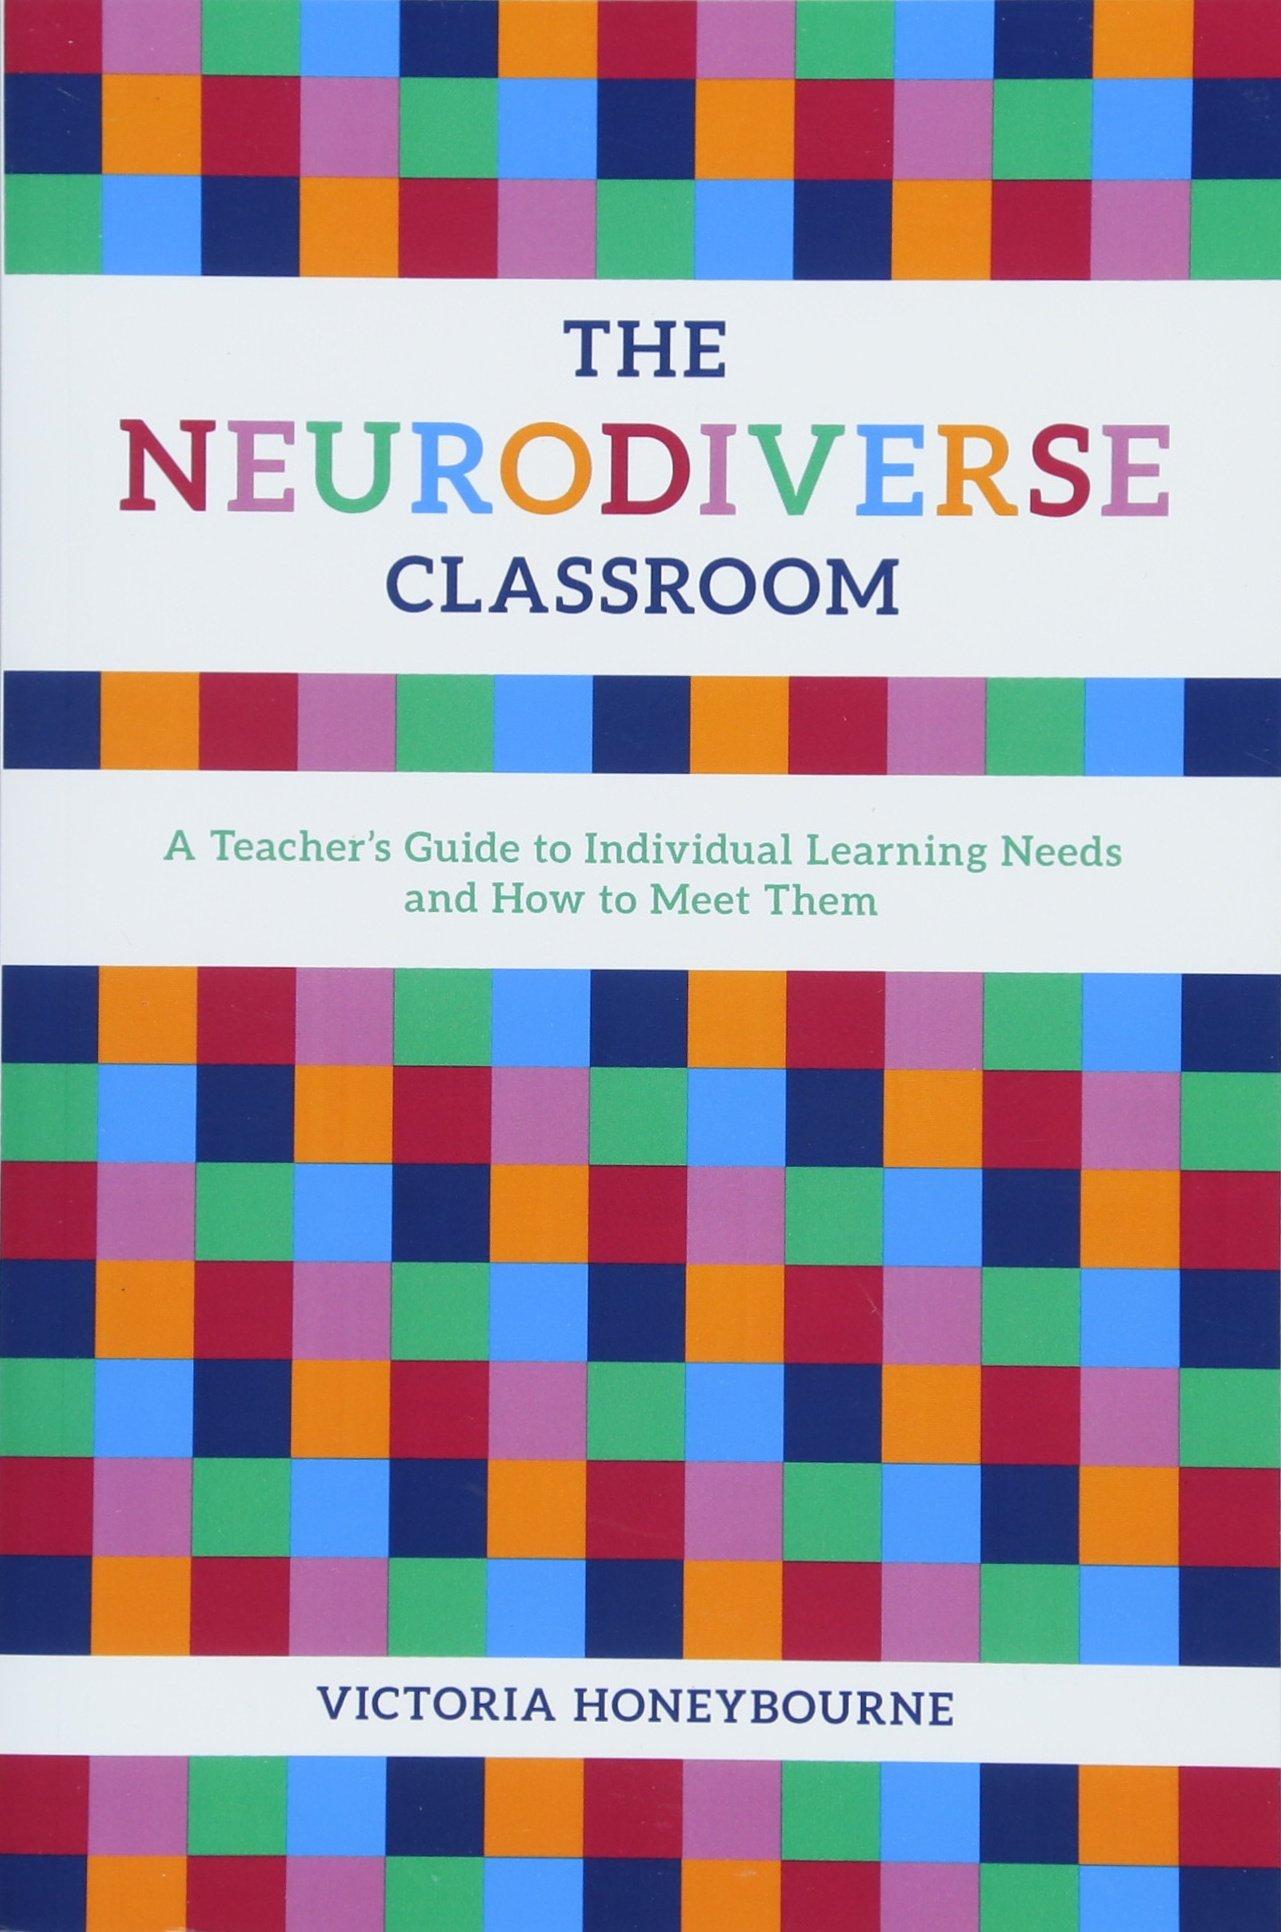 Neurodiversity And Differentiation >> Amazon Com The Neurodiverse Classroom 9781785923623 Victoria